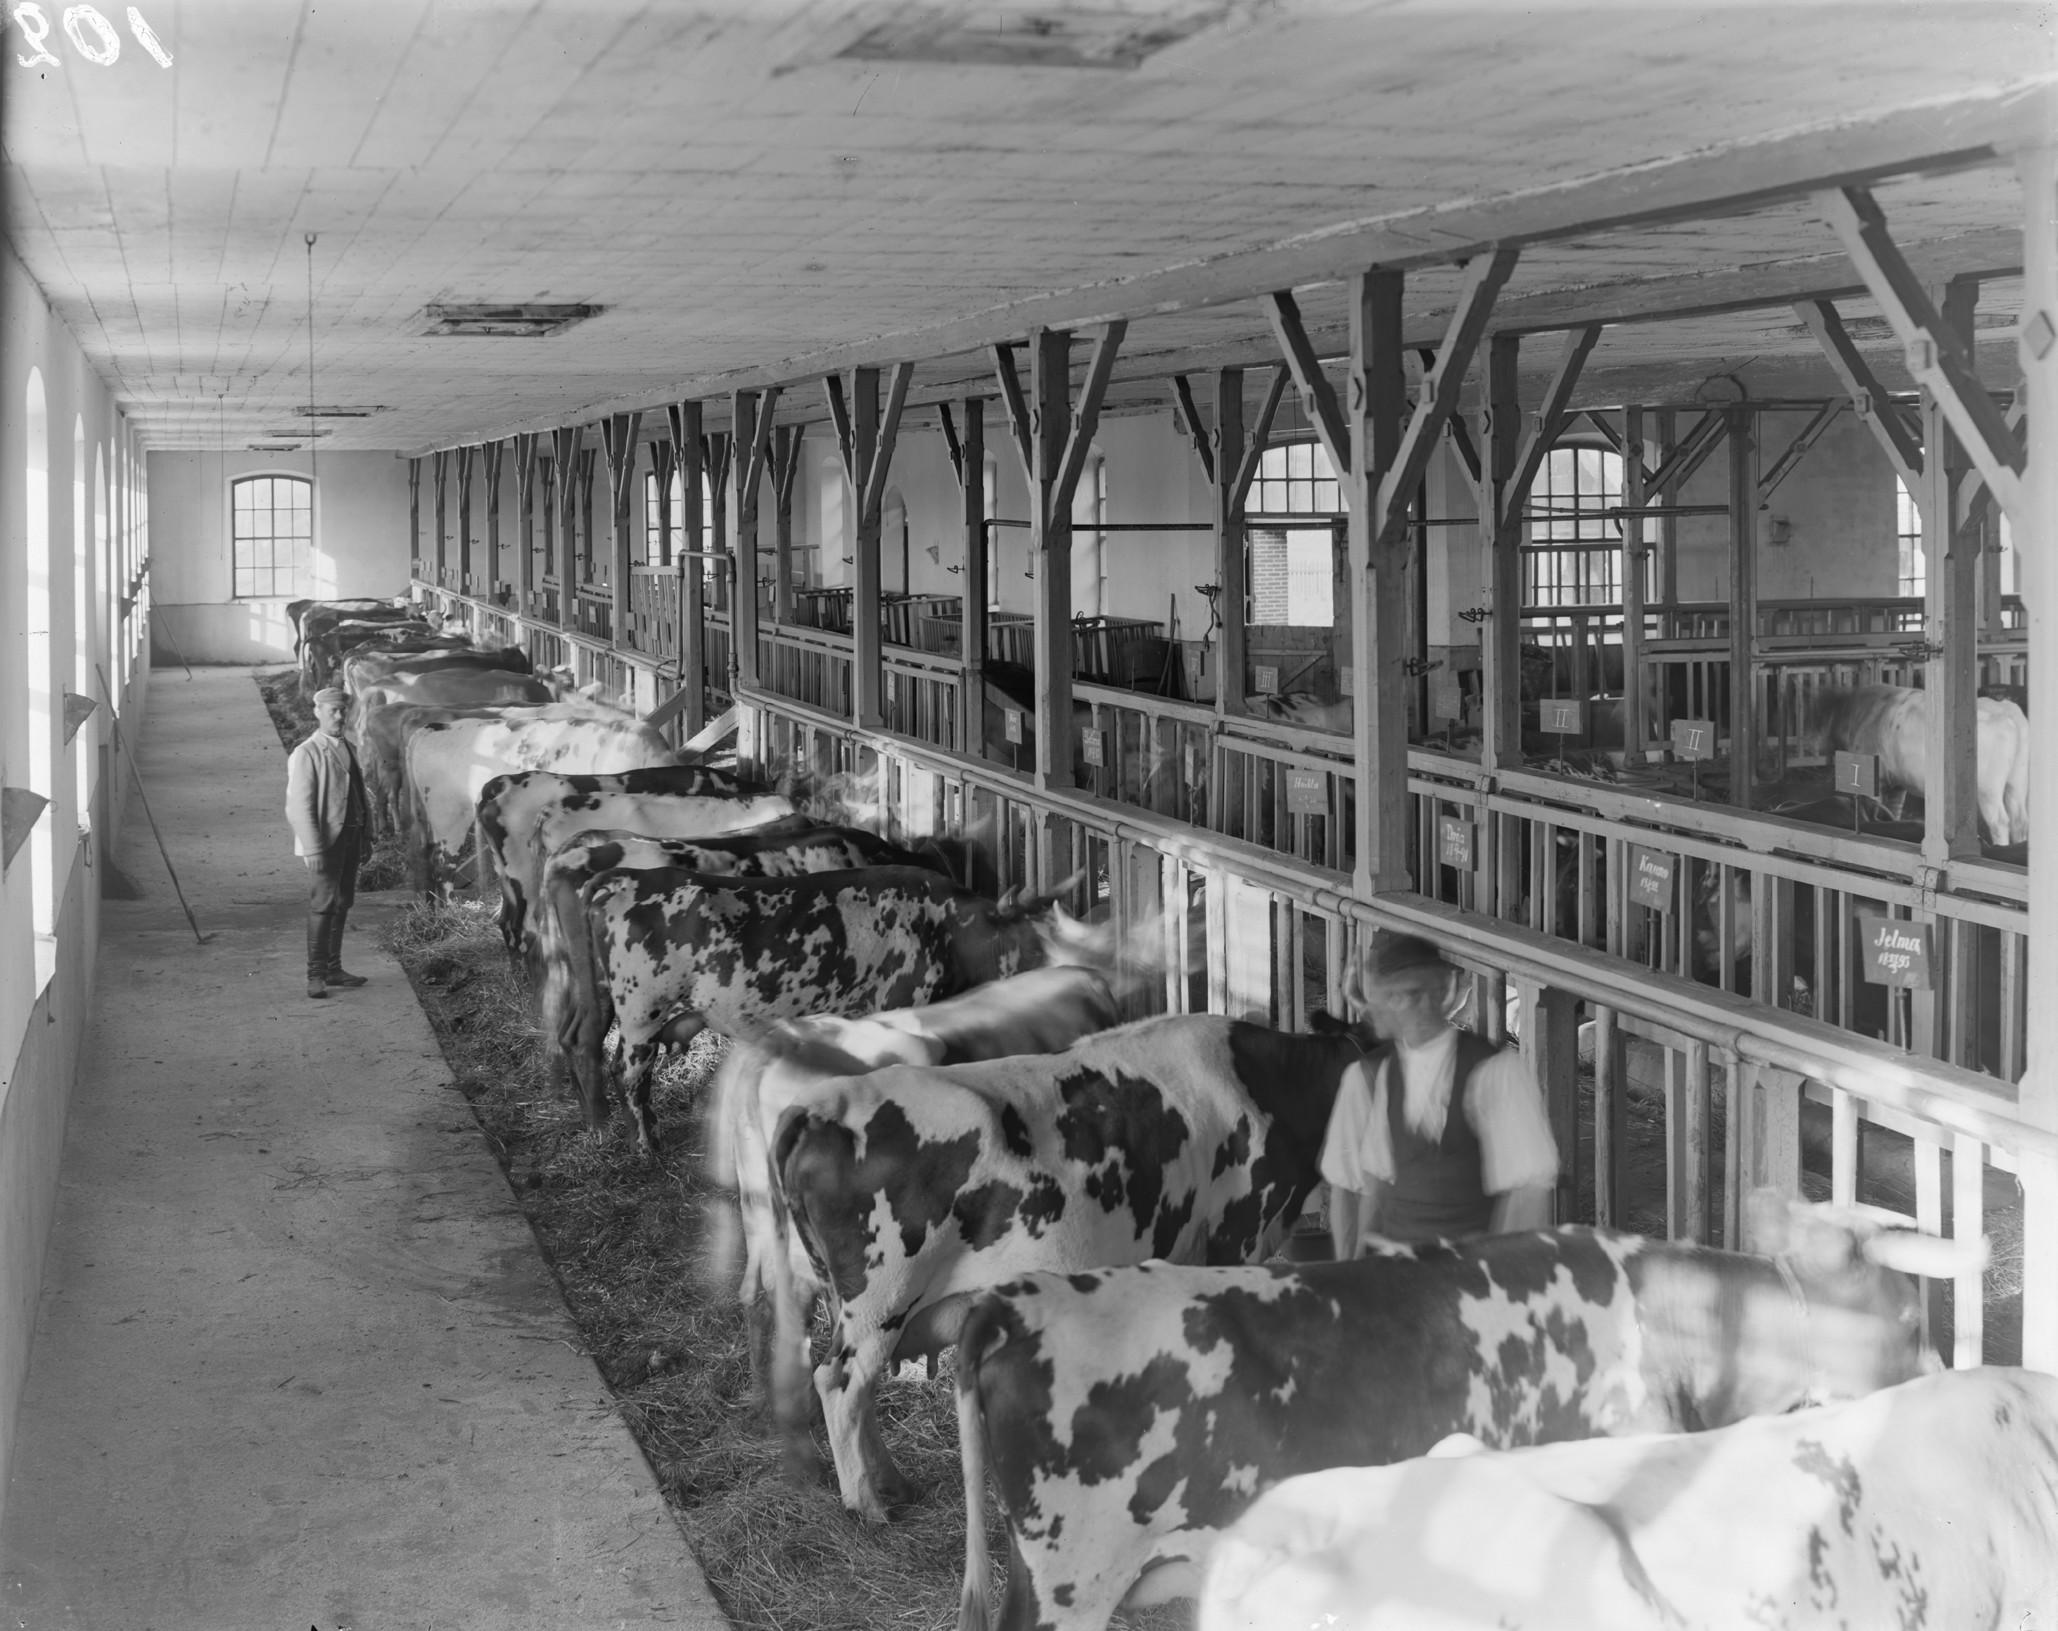 Fazenda de gado leiteiro, parte da série sobre Agricultura Finlandesa [1899]